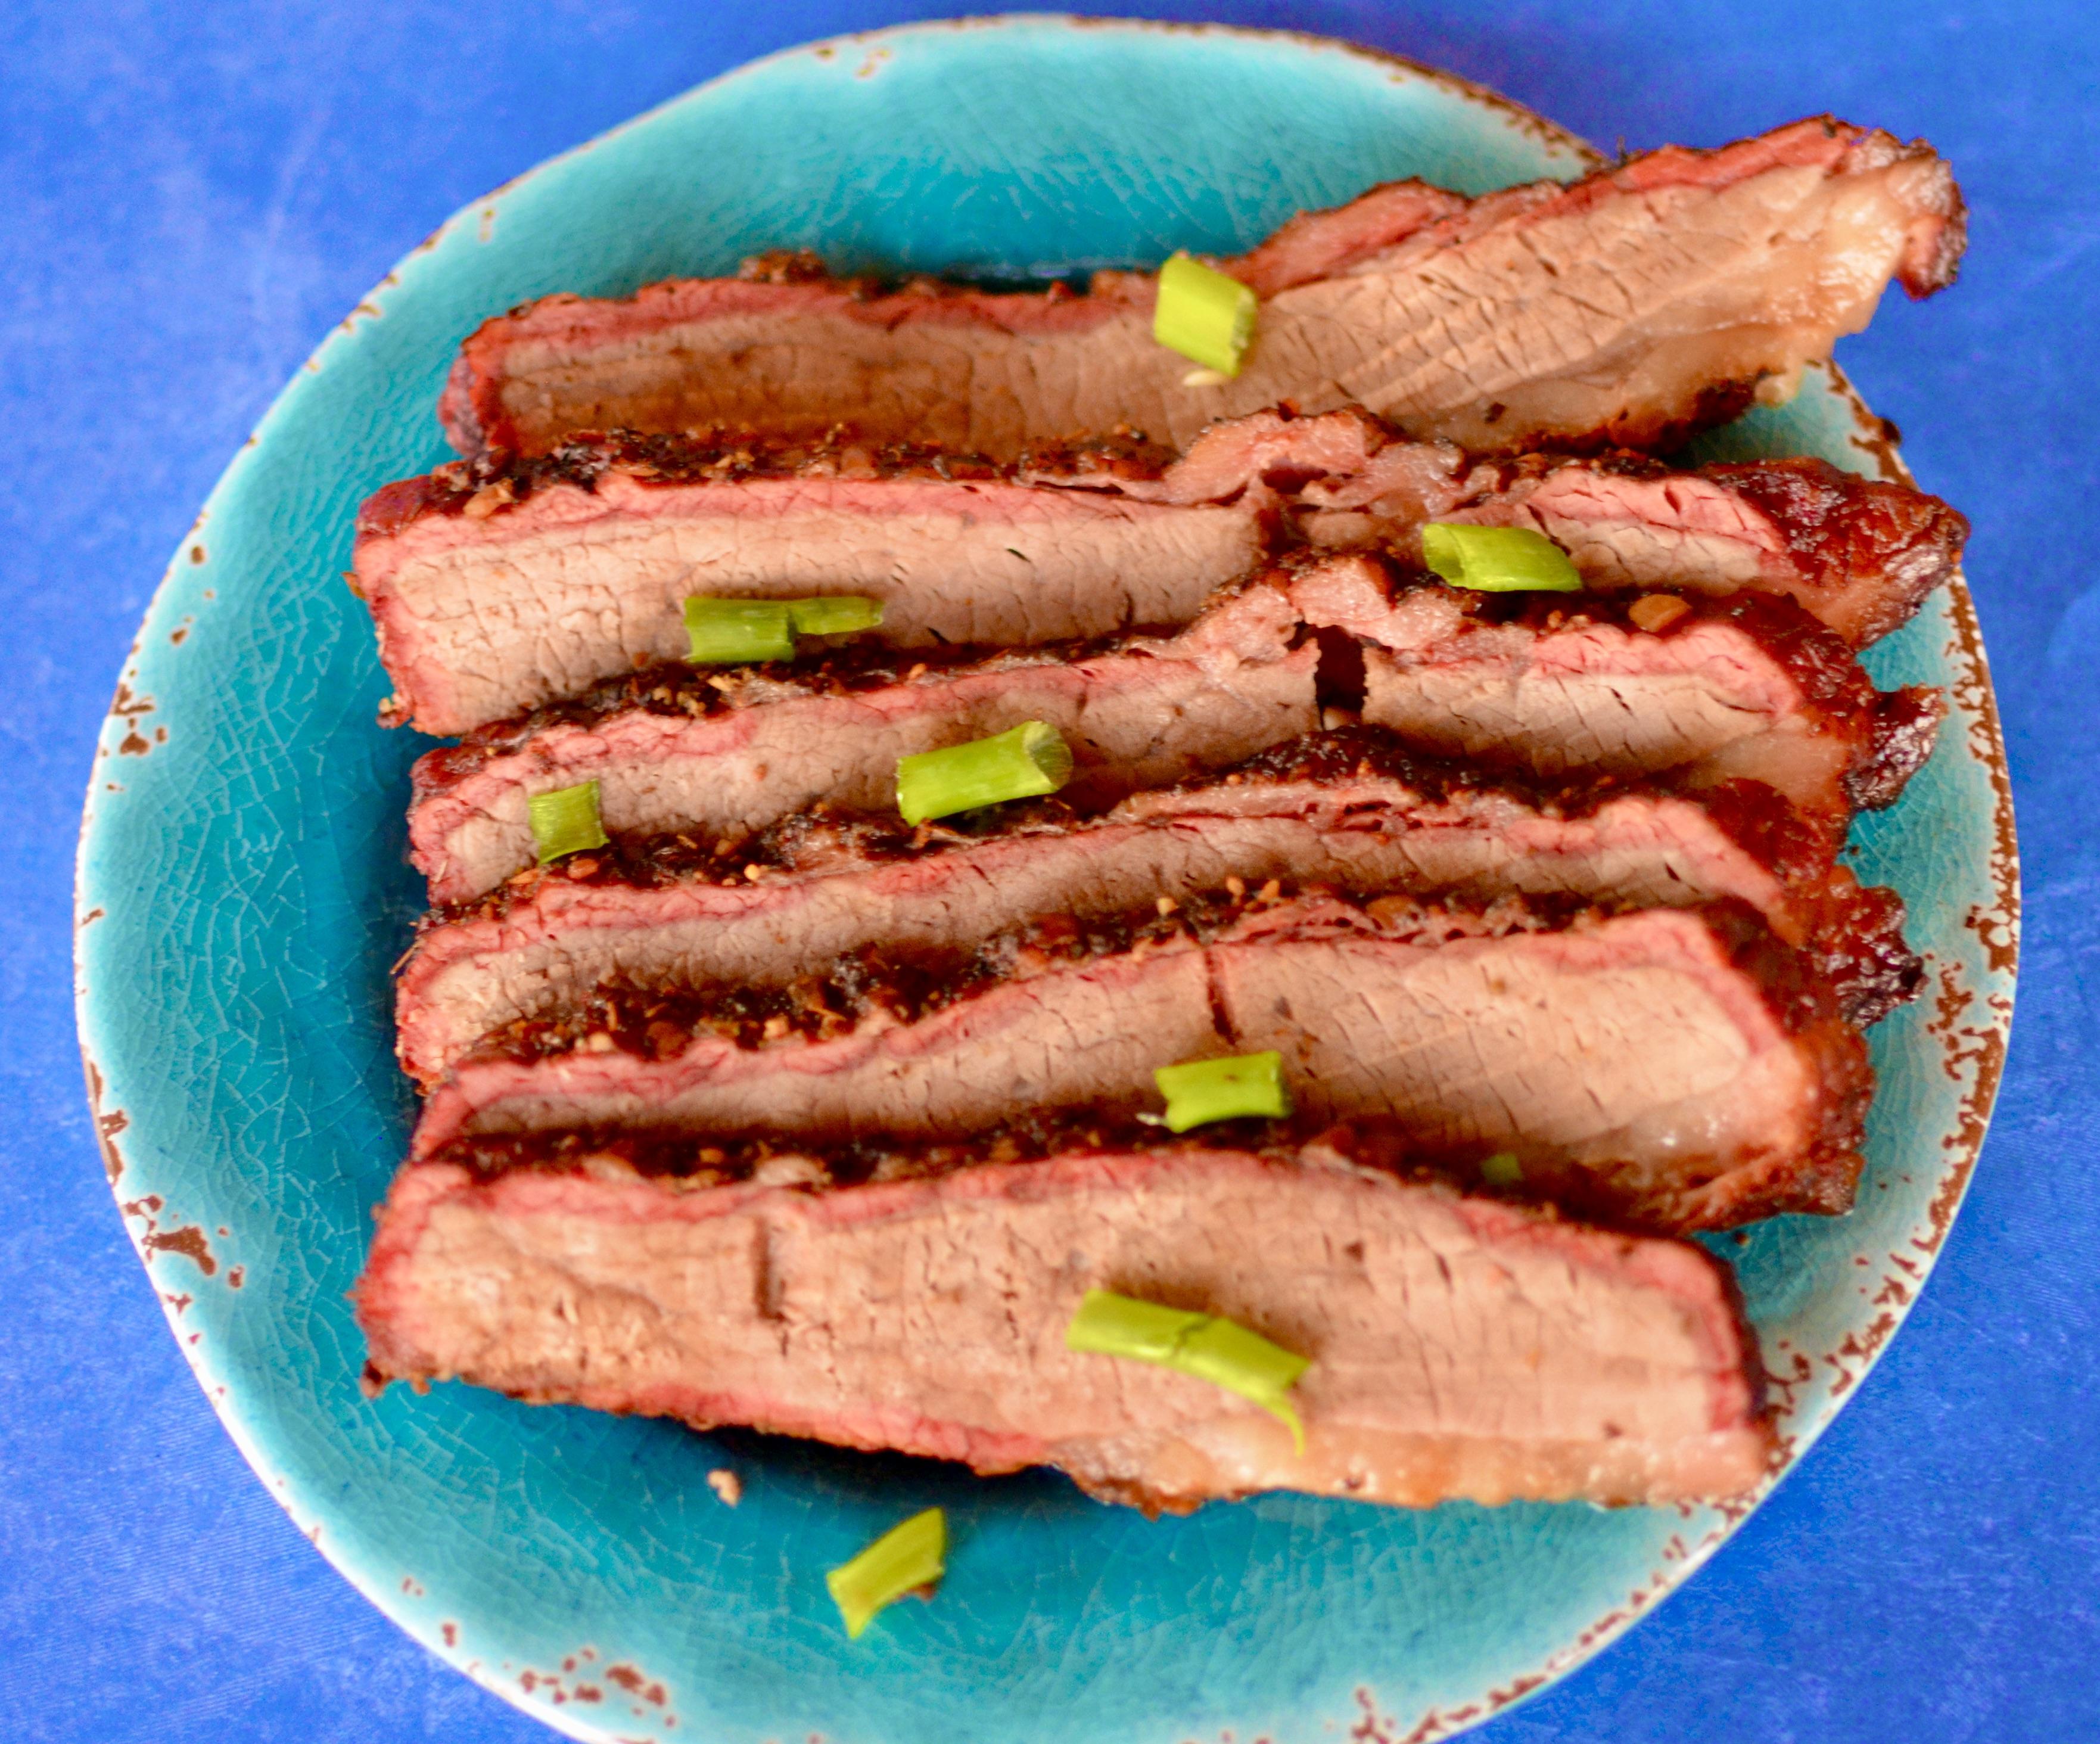 David's Mesquite Smoked Texas Brisket